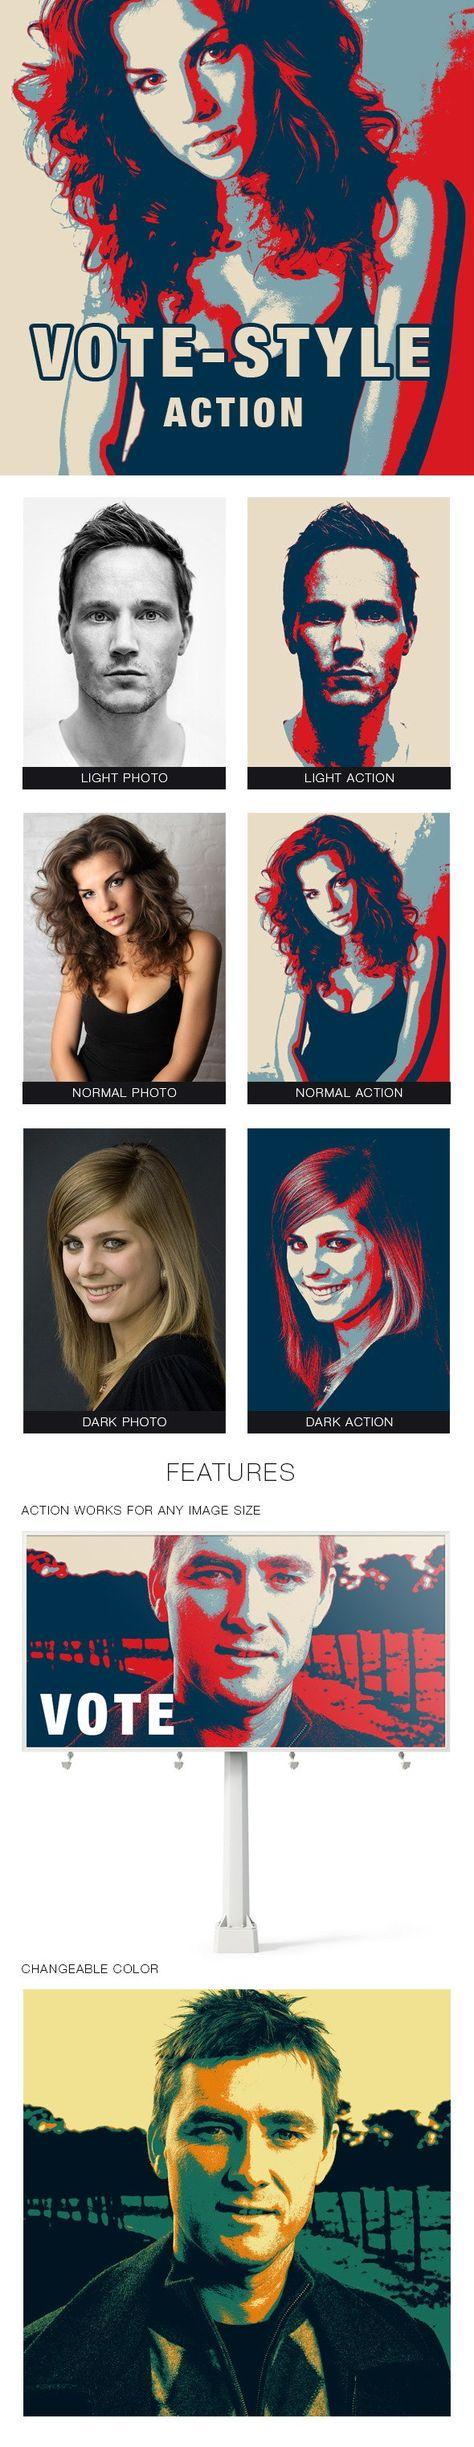 Vote-style Photoshop Action